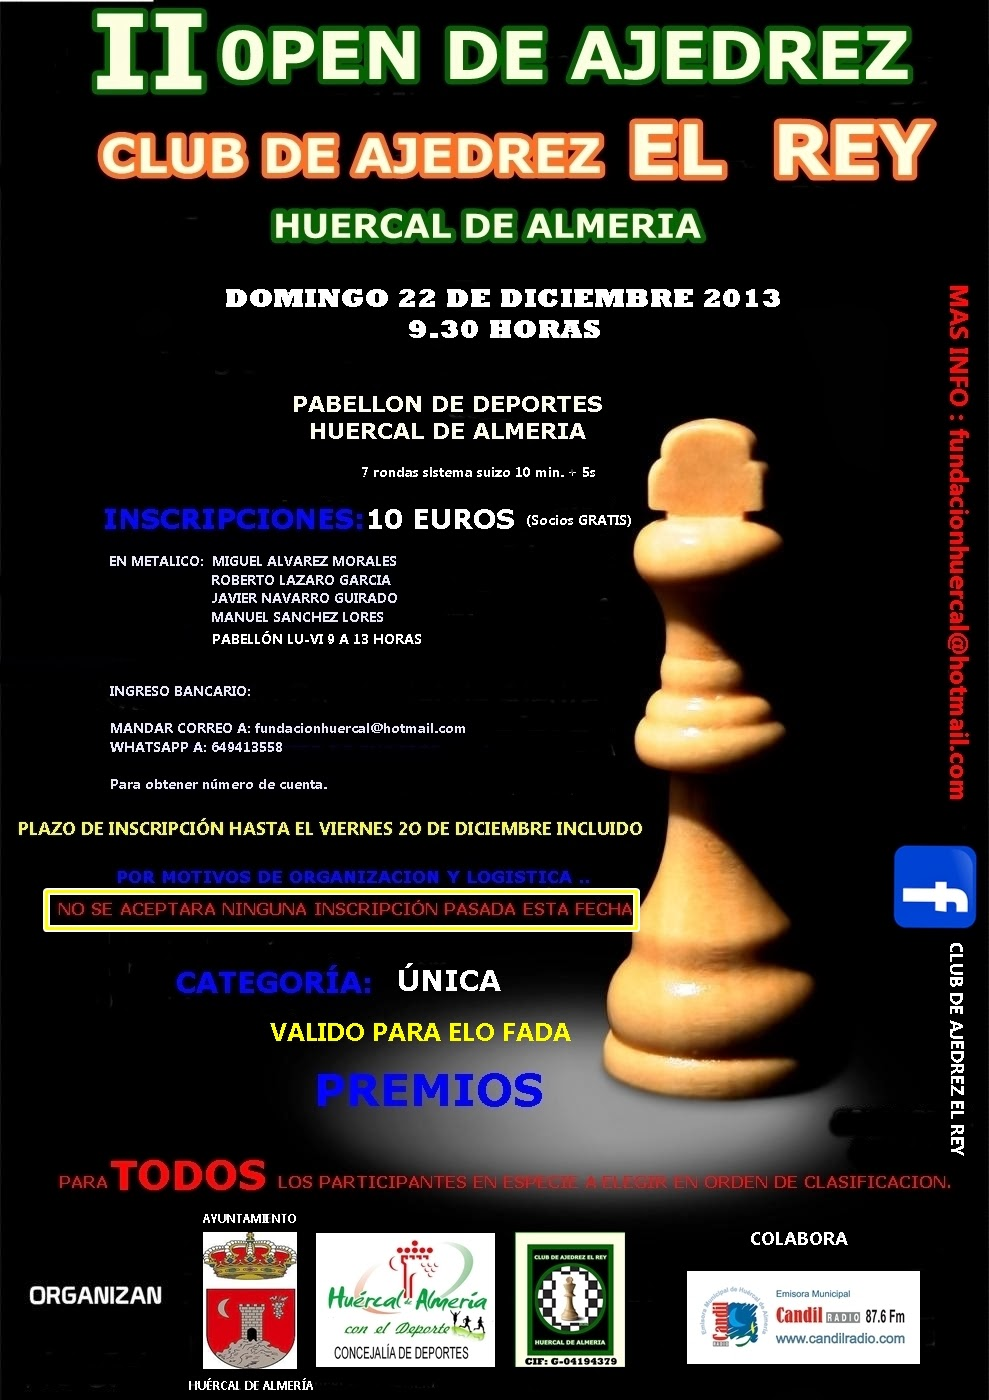 OPEN DE NAVIDAD DE HUERCAL DE ALMERIA